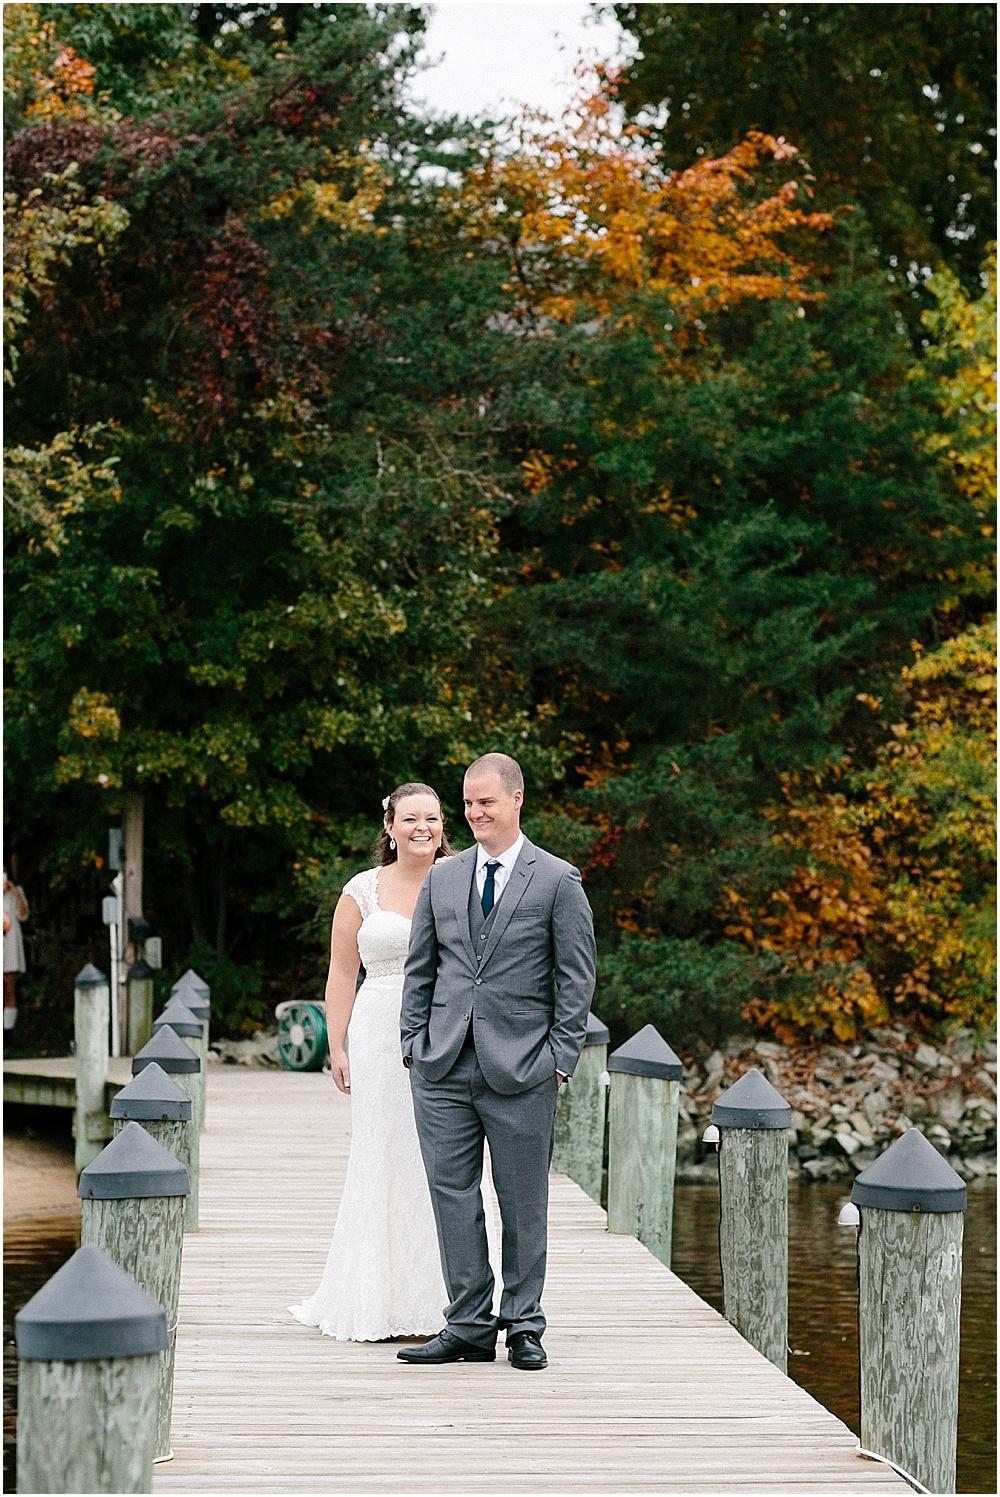 Celebration_At_The_Bay_Wedding_Baltimore_Wedding_Photographer_0019